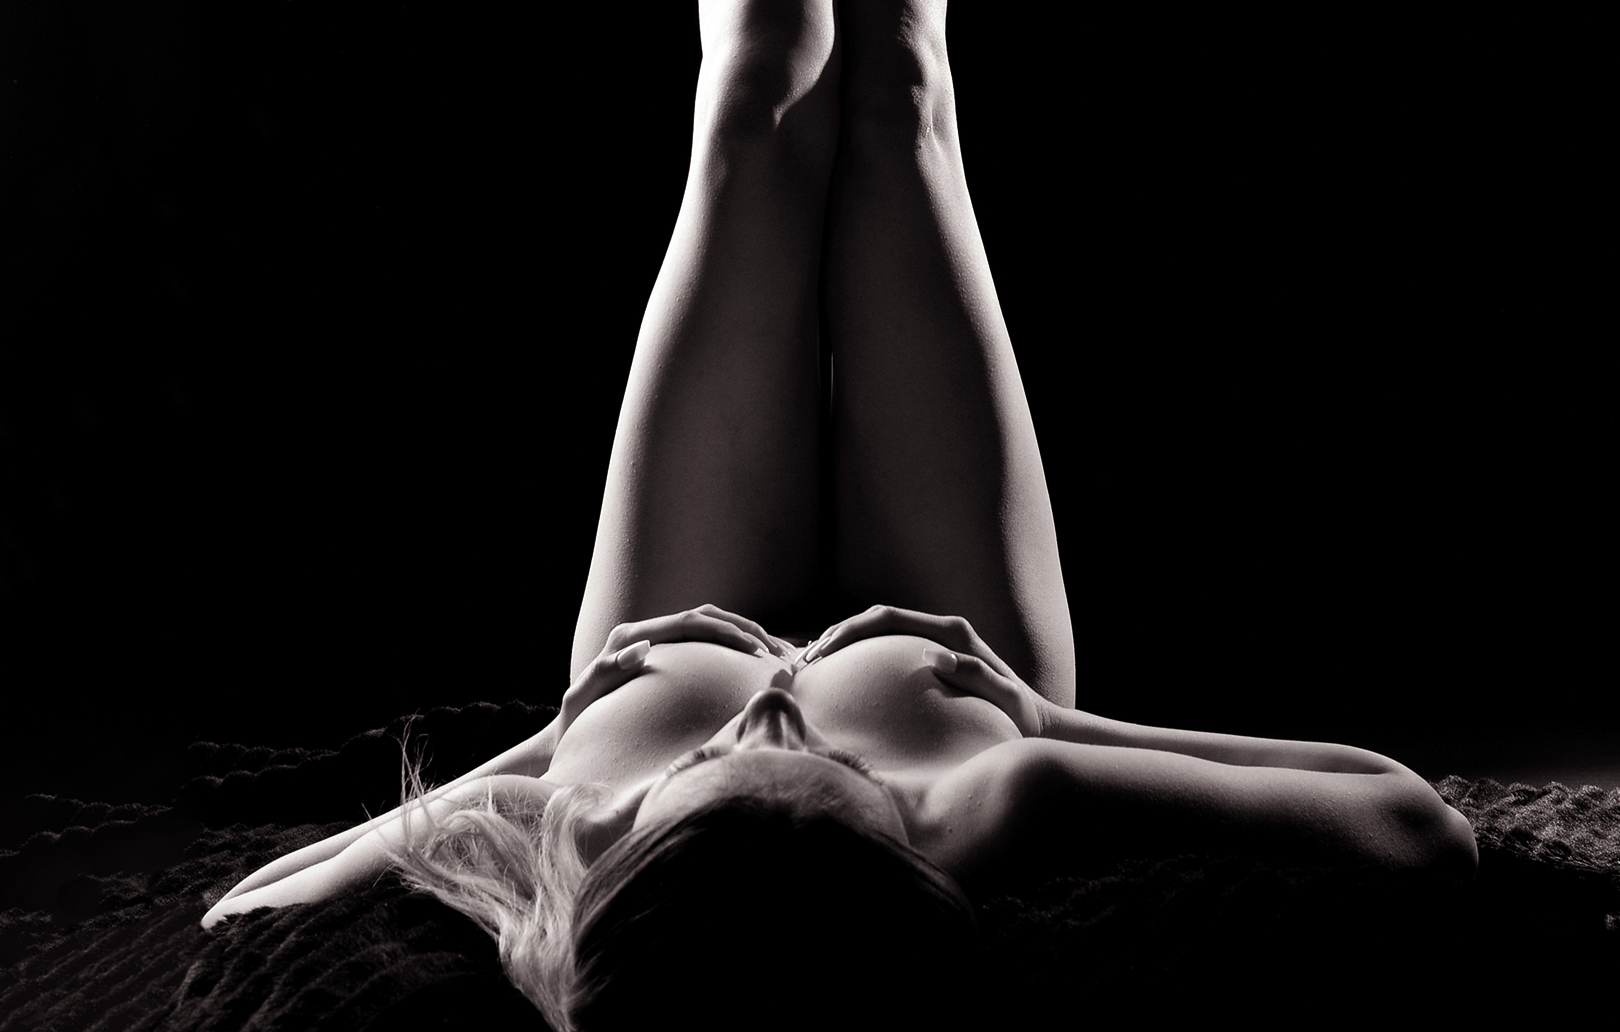 erotisches-fotoshooting-frankfurt-am-main-bg21610535262